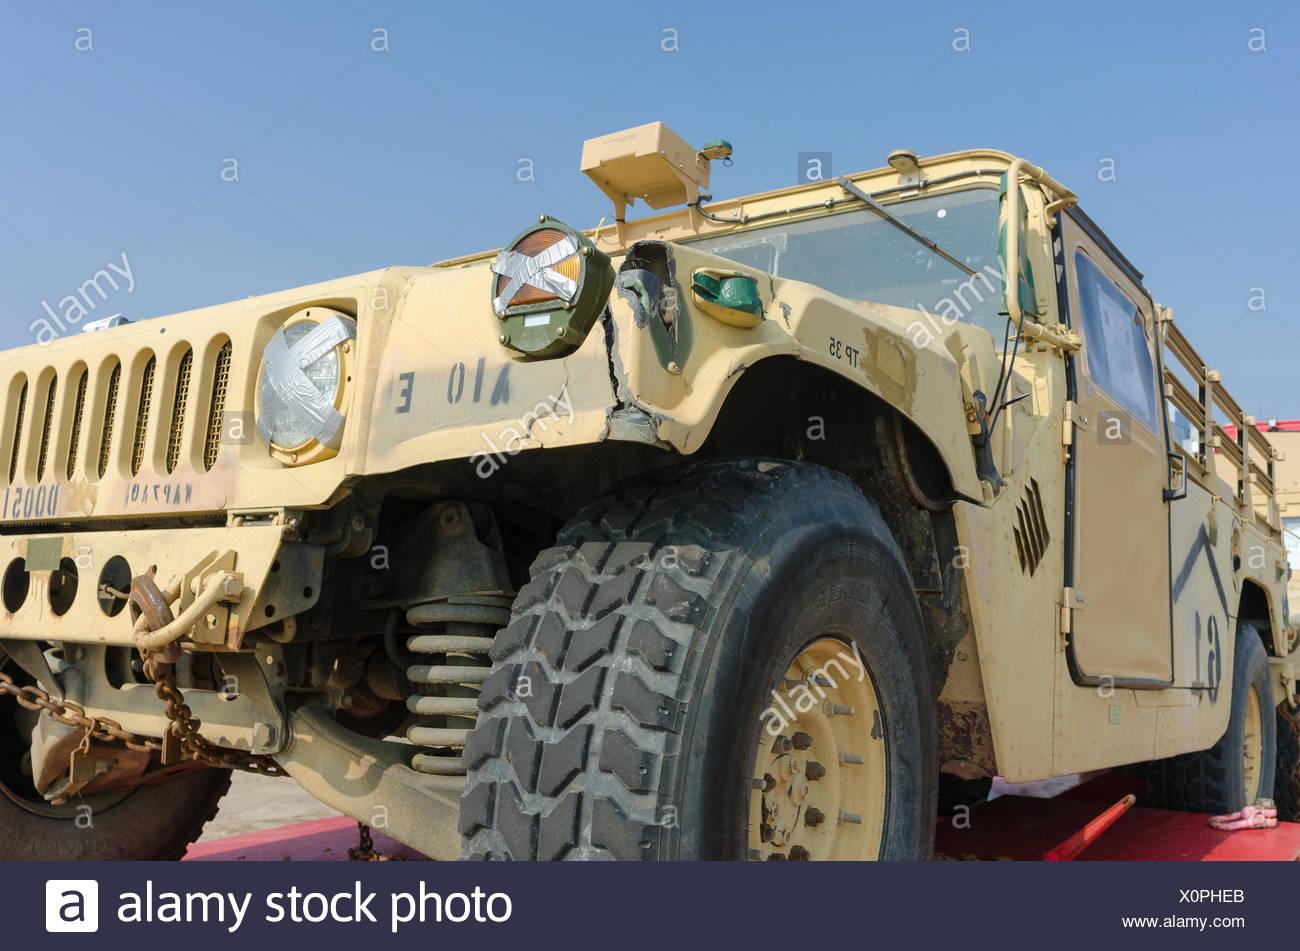 Military car. Stock Photo